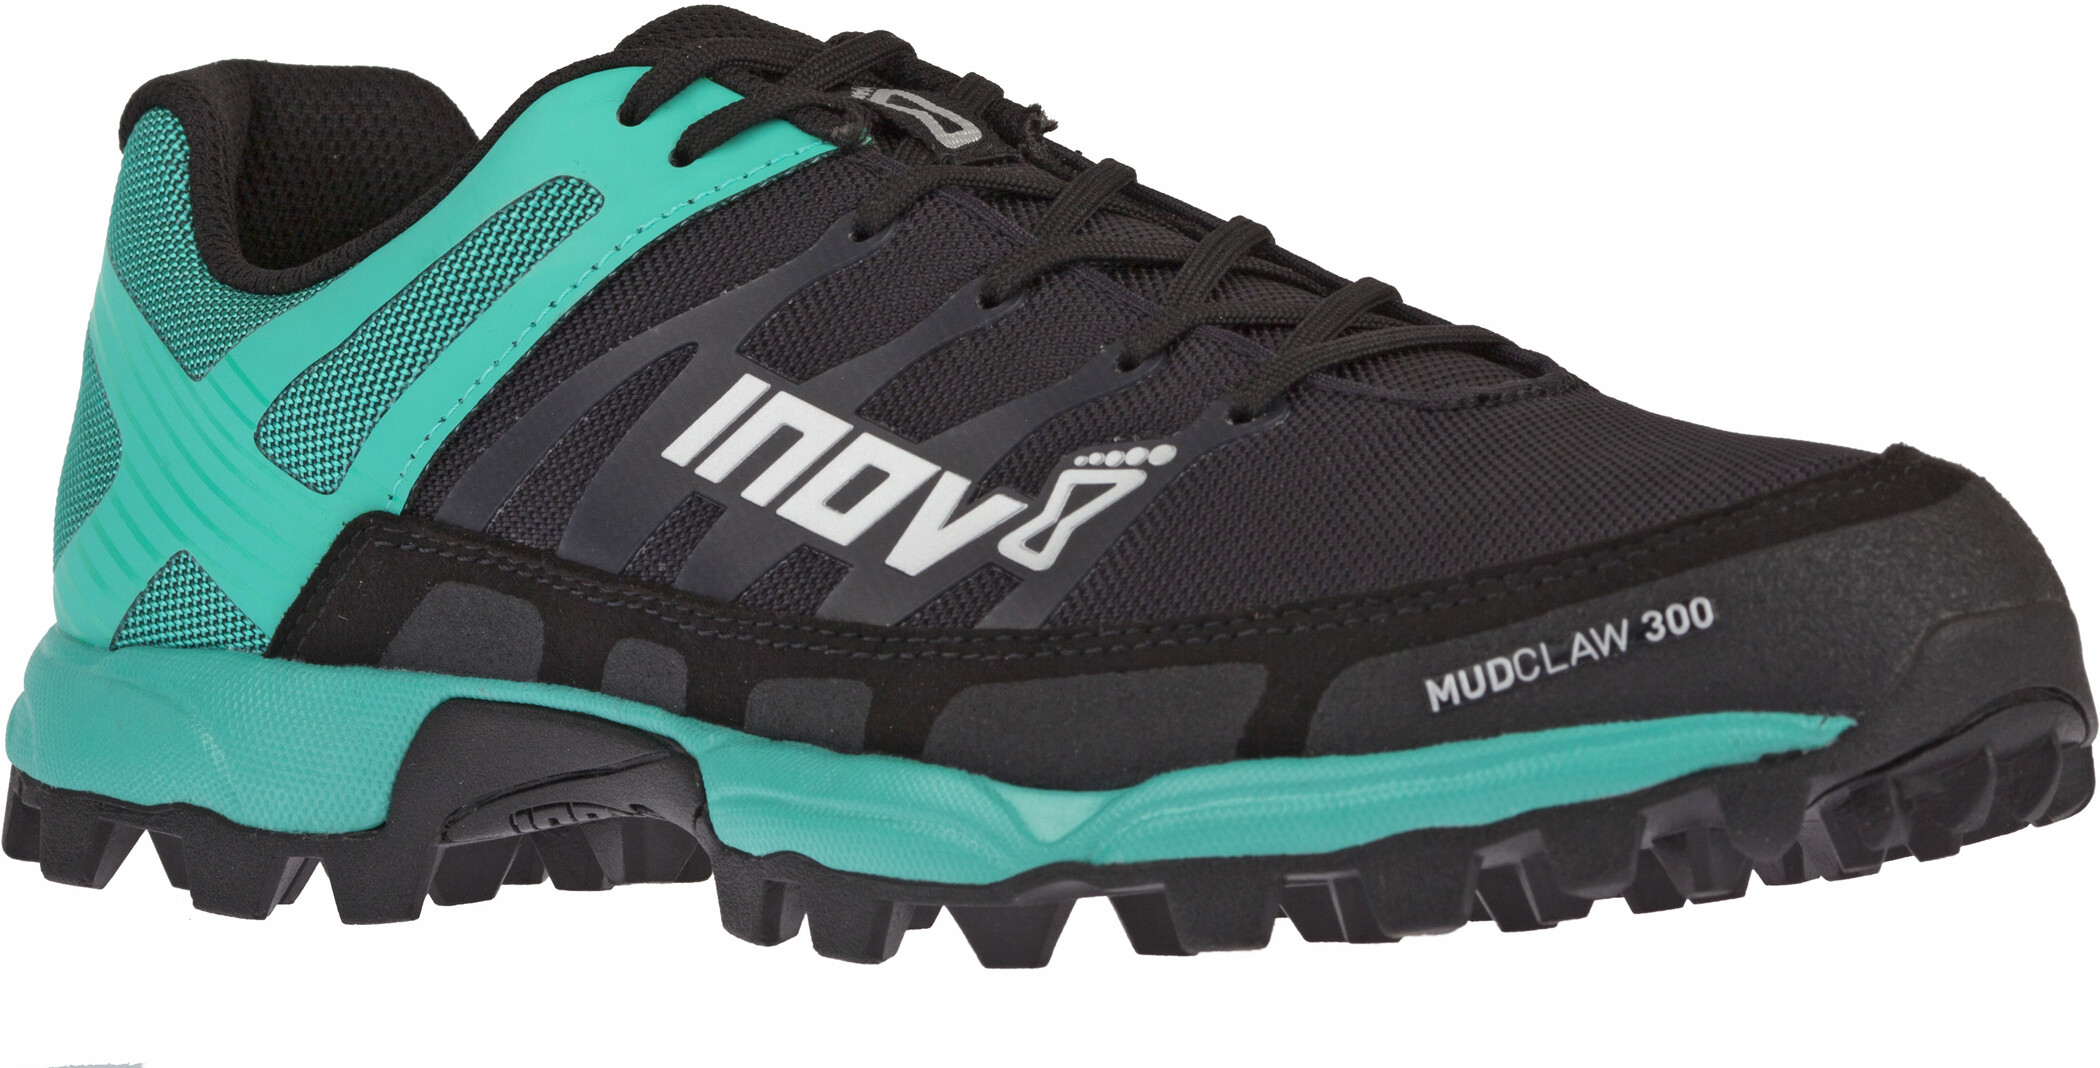 inov-8 Mudclaw 300 Løbesko Damer, black/teal (2019)   Running shoes